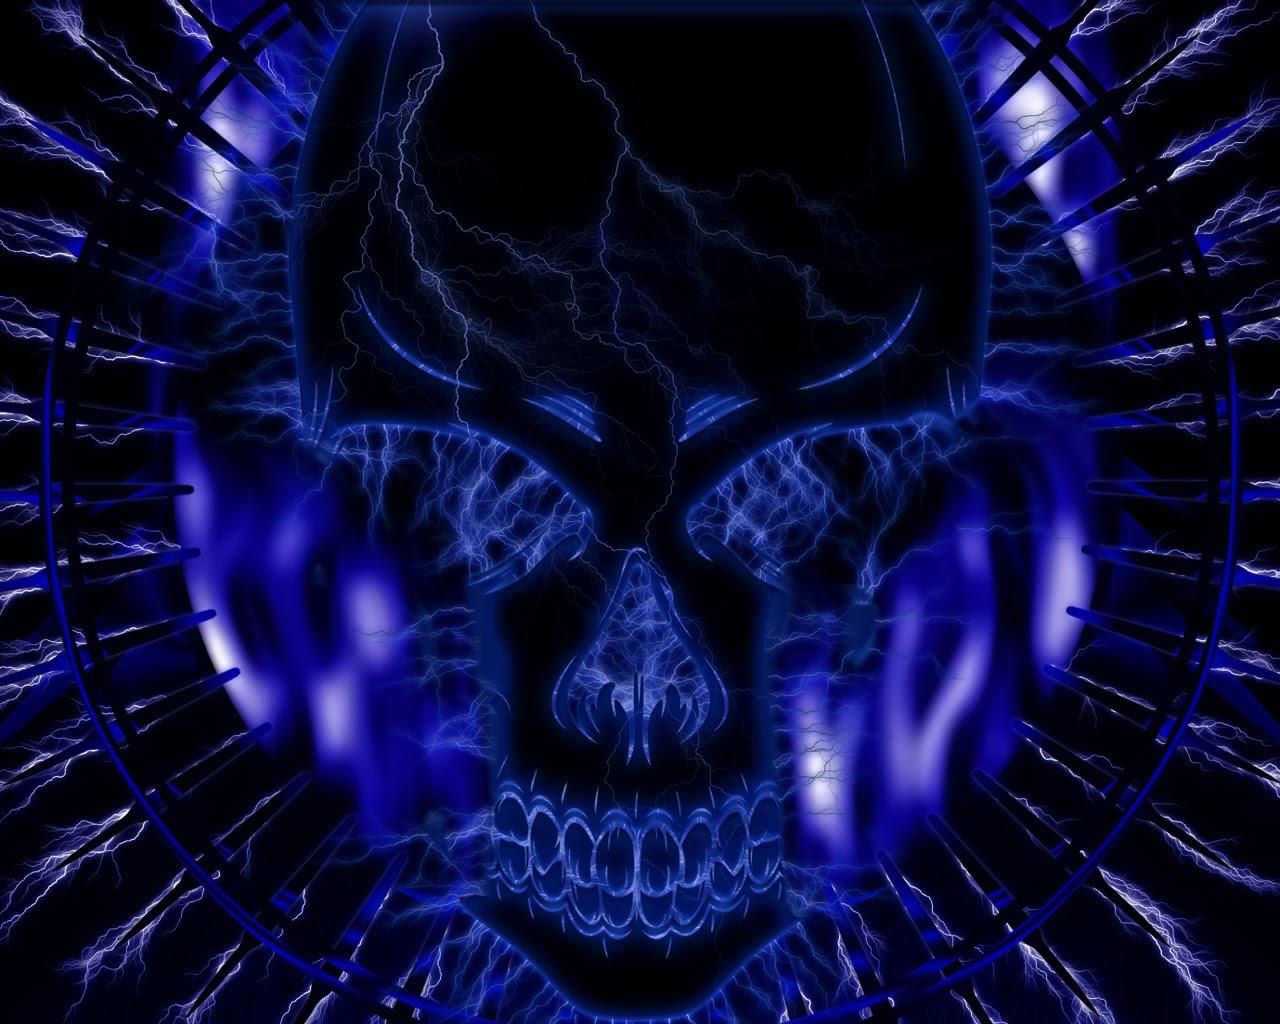 Cool Skull Wallpaper Backgrounds